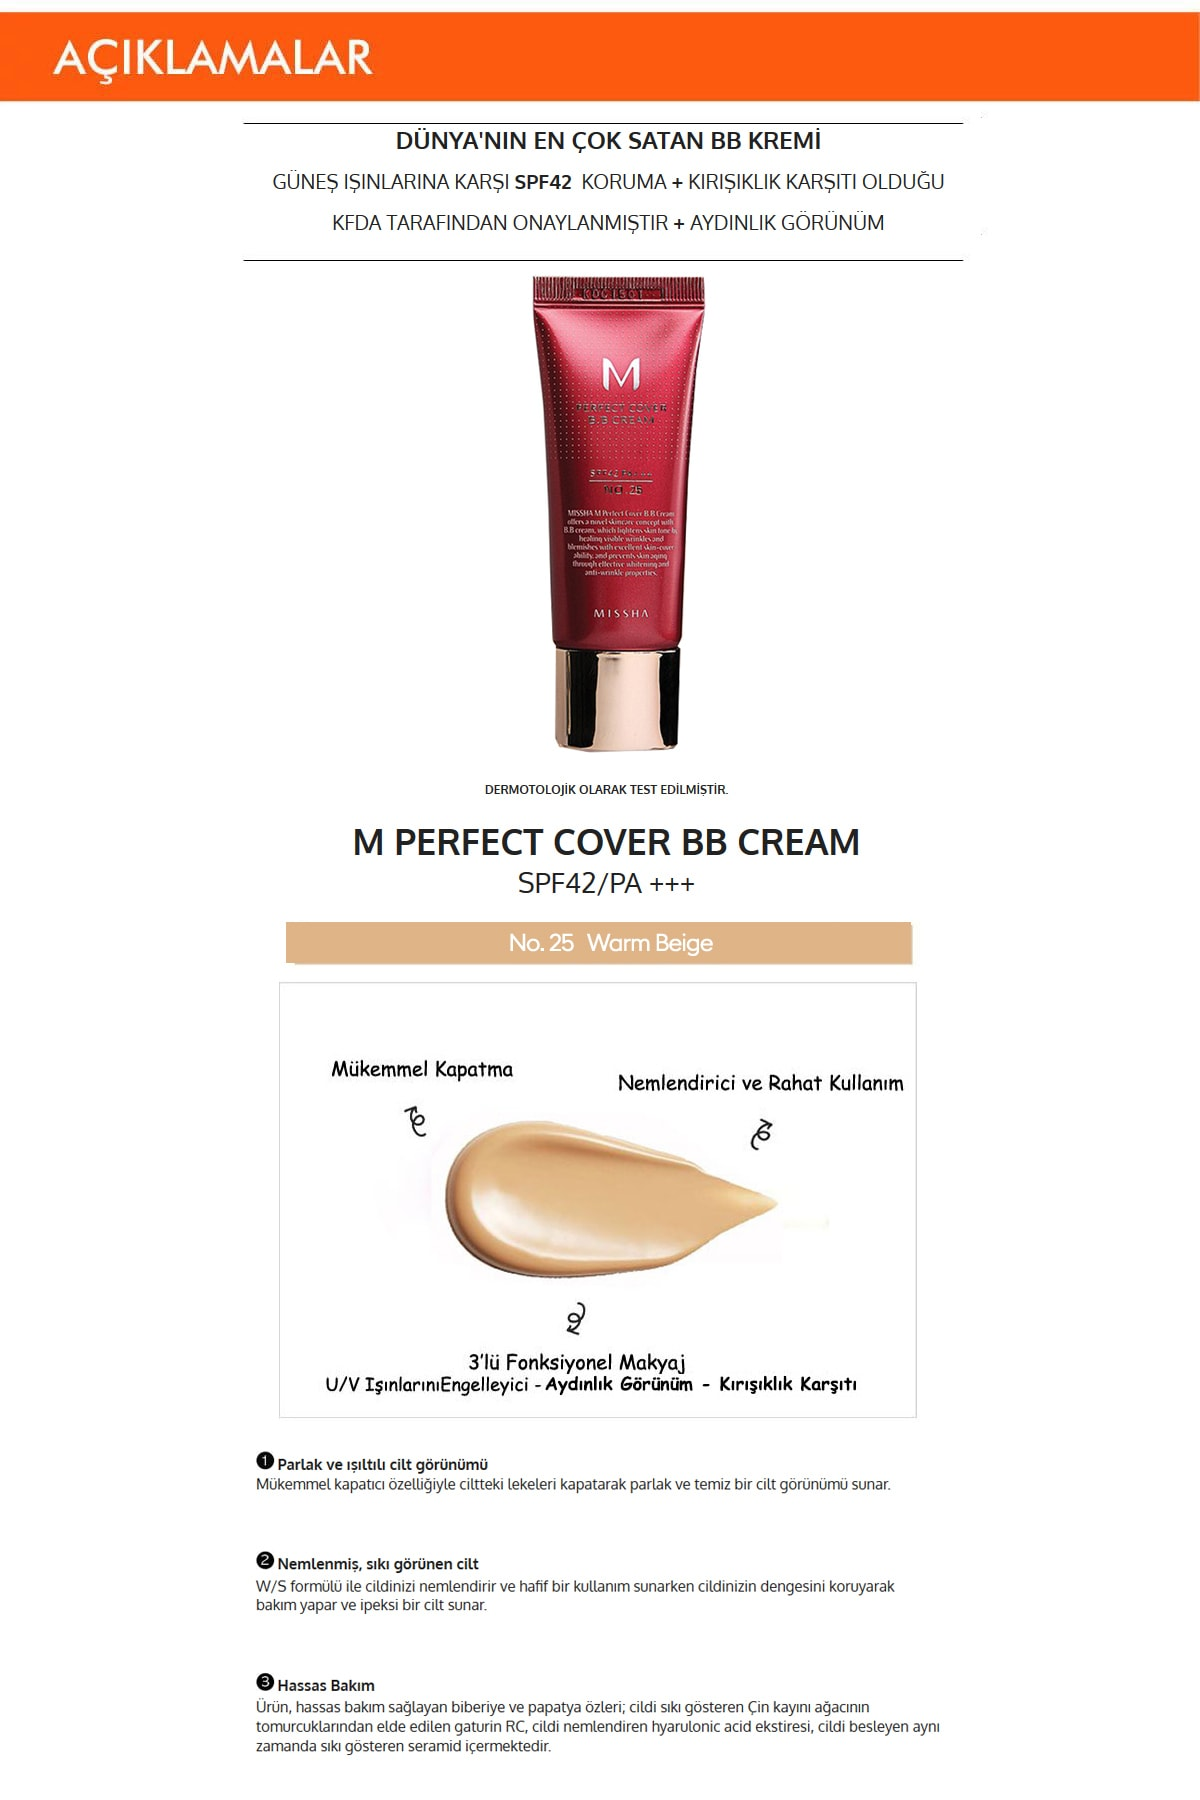 Missha Yoğun Kapatıcılık Sunan BB Krem M Perfect Cover BB Cream SPF42/PA+++ No: 25 ( 20 ML ) 1